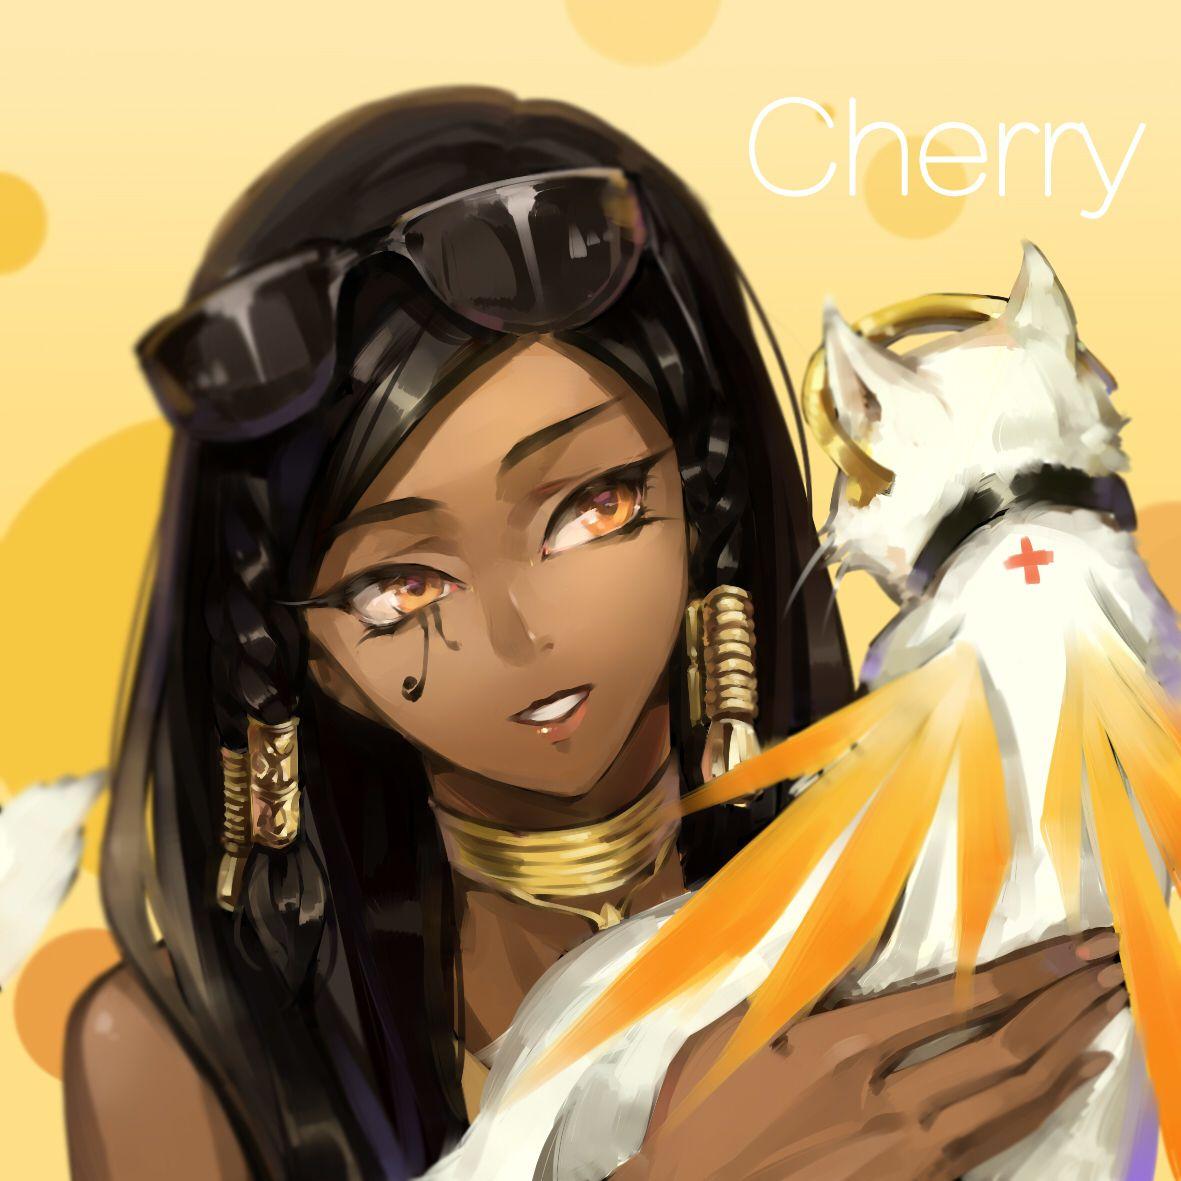 Pin by feleena moniz on overwatch overwatch pharah - Evageeks forum ...